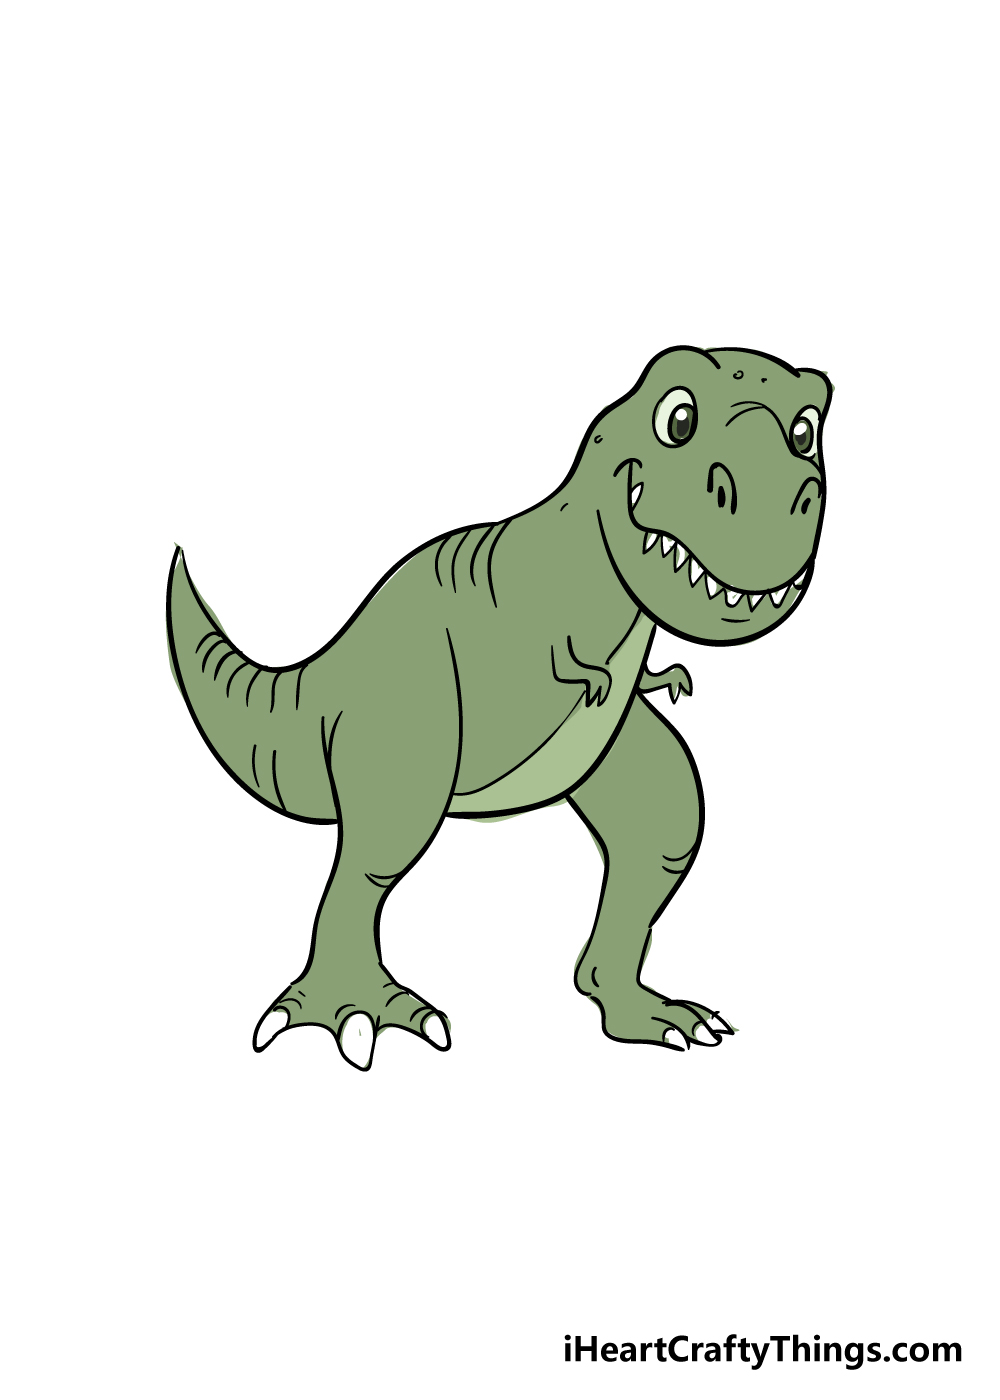 t-rex drawing step 9